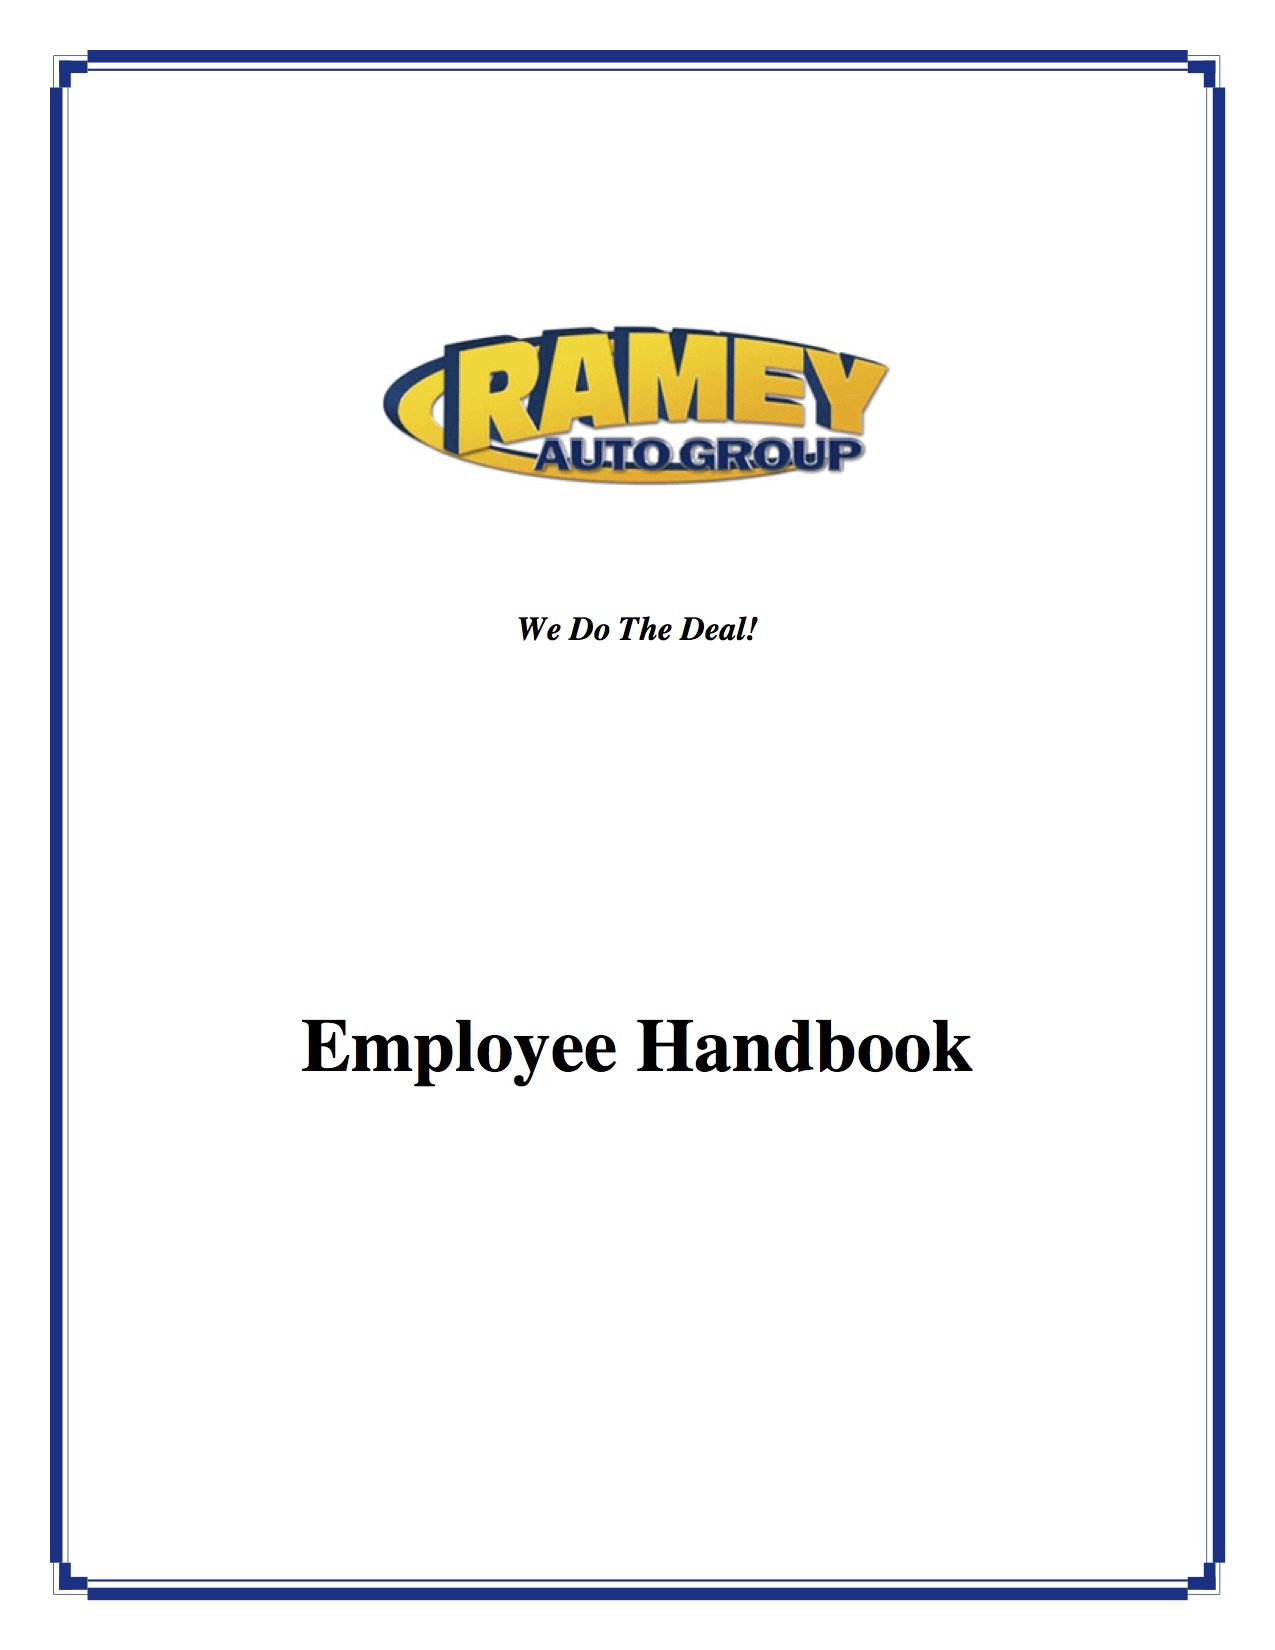 Document Center - Ramey Employee